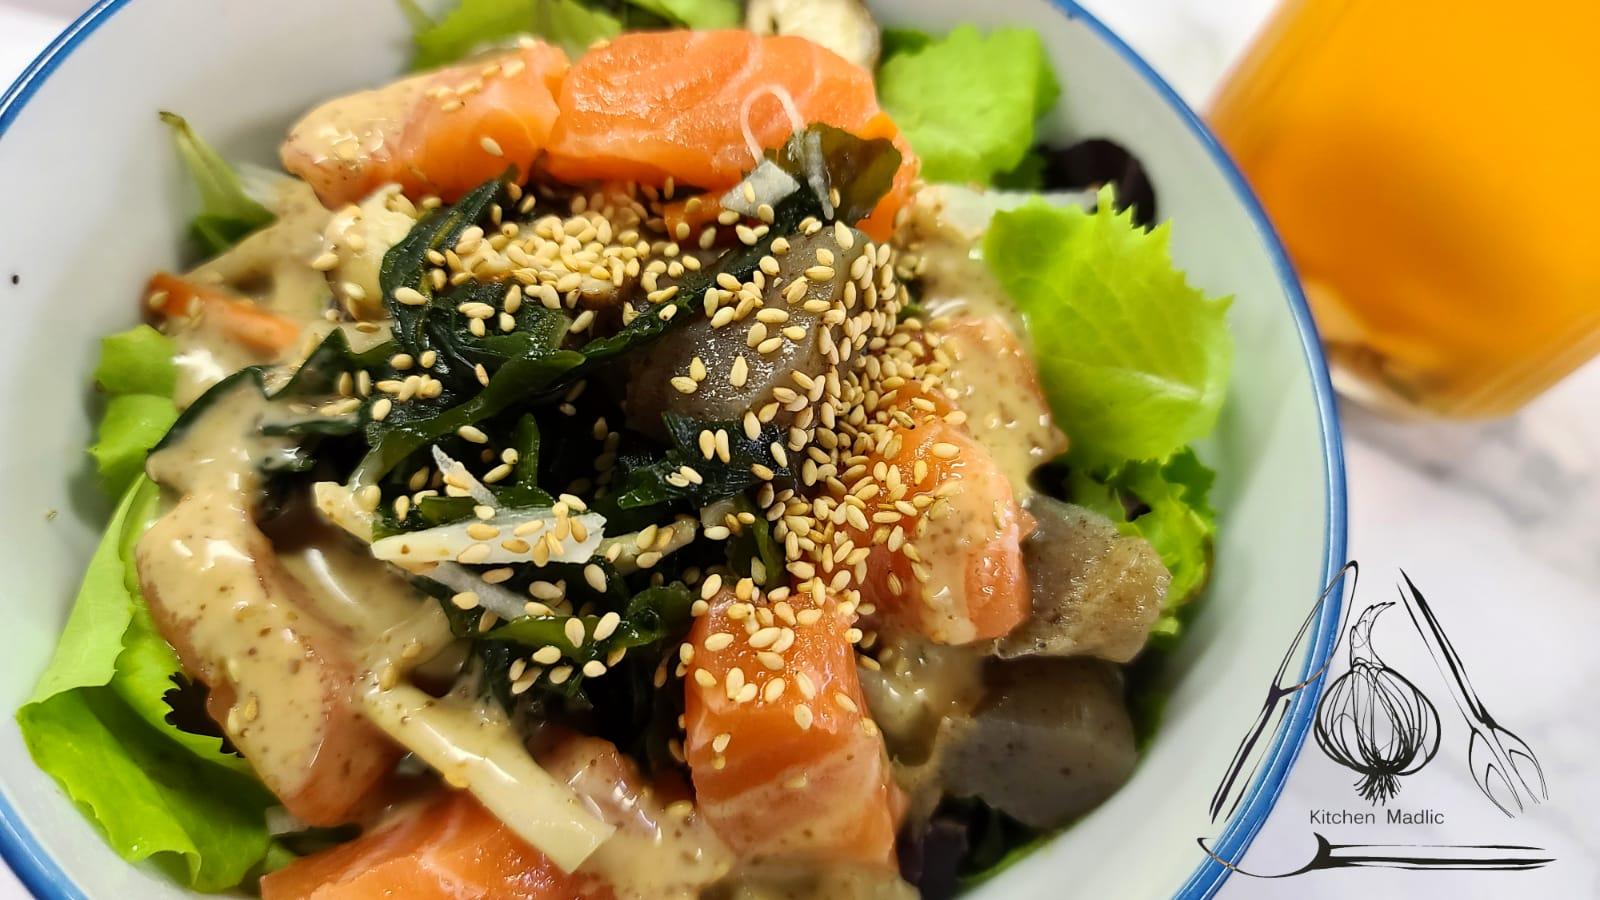 三文魚日式昆布蒟蒻沙律。(Kitchen Madlic提供)